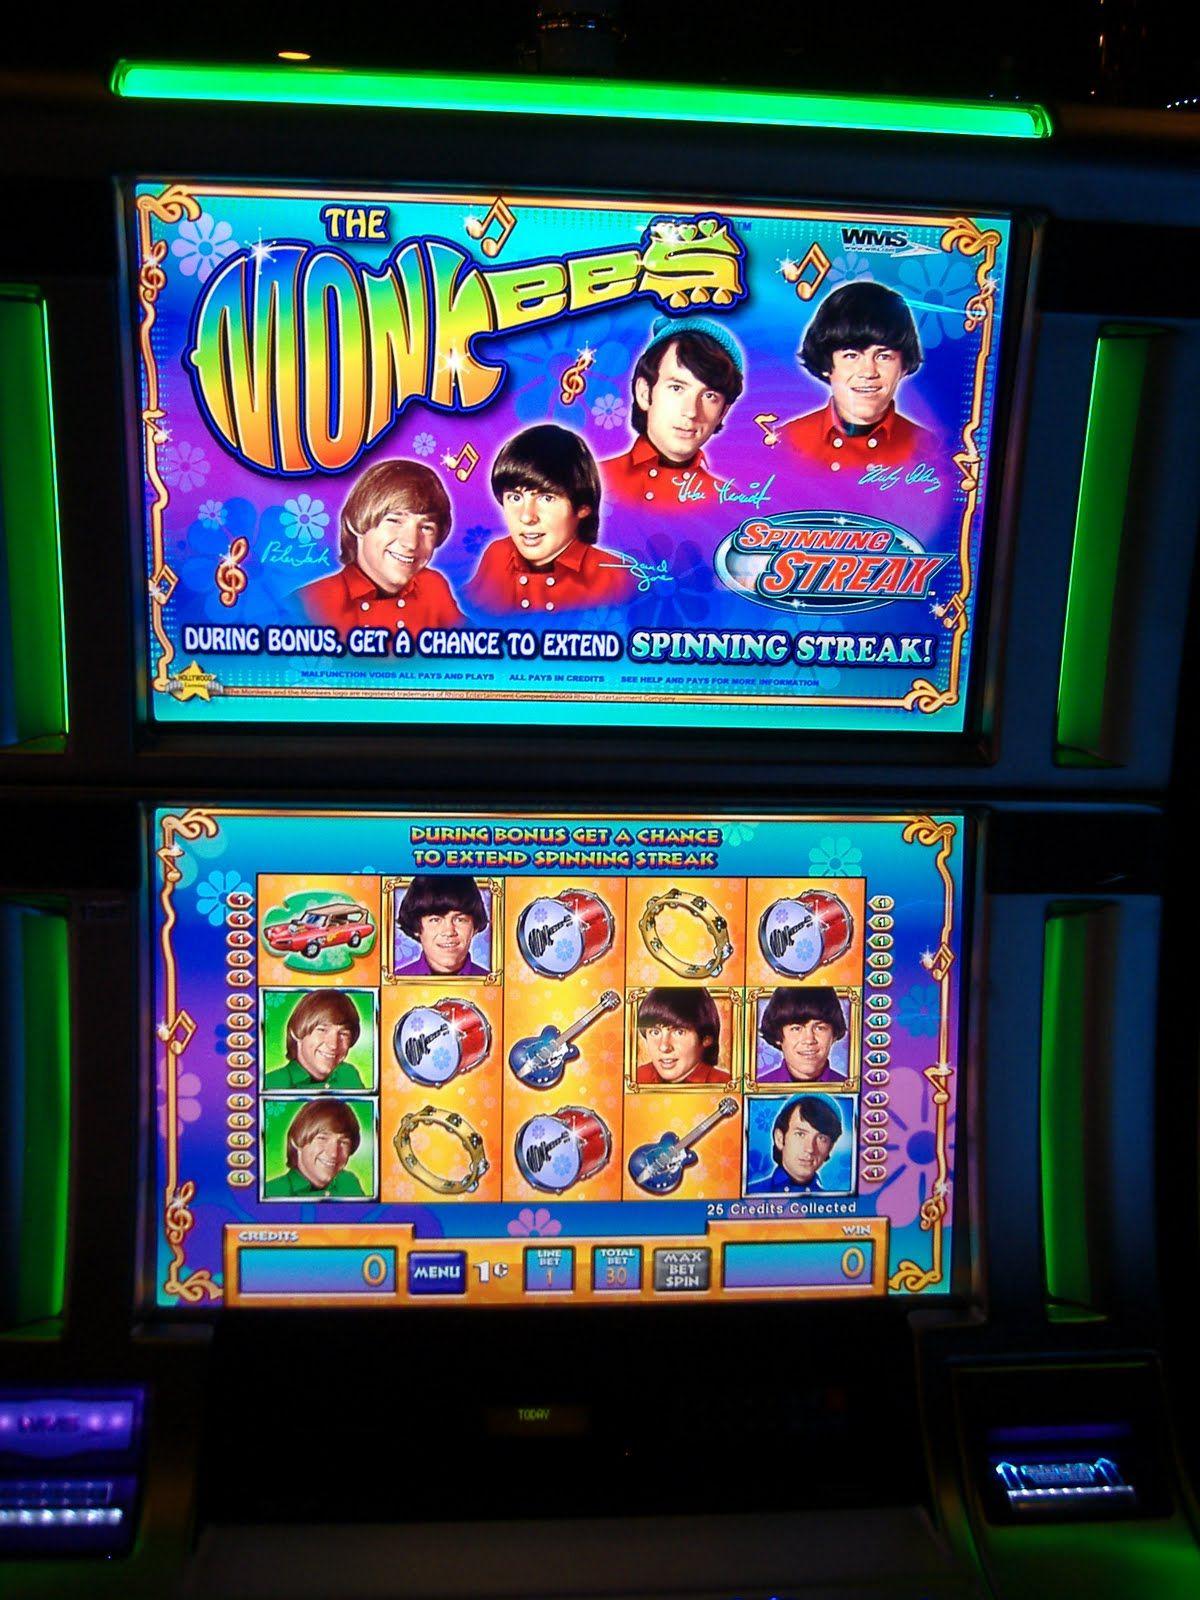 Casino slot machines are loose everytime blackhawk gambling bus